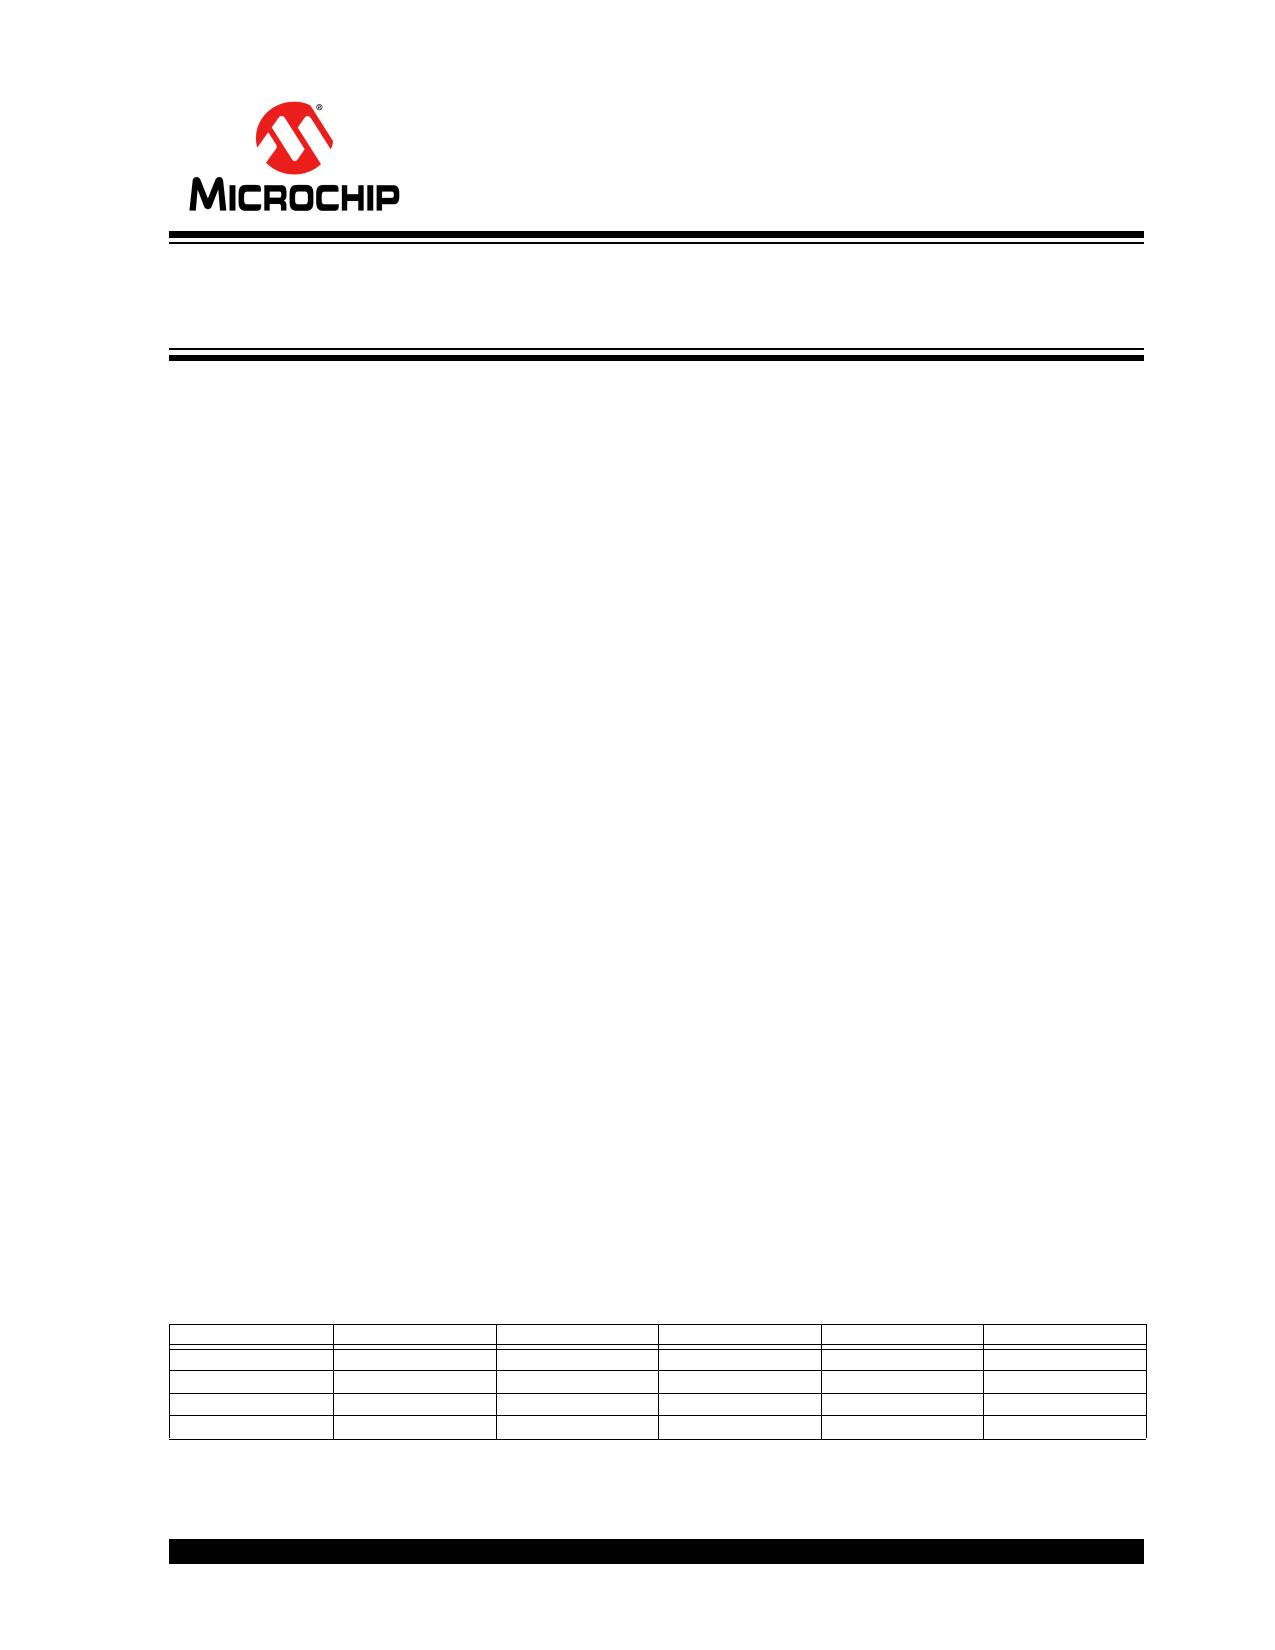 PIC24HJ64GP504 데이터시트 및 PIC24HJ64GP504 PDF